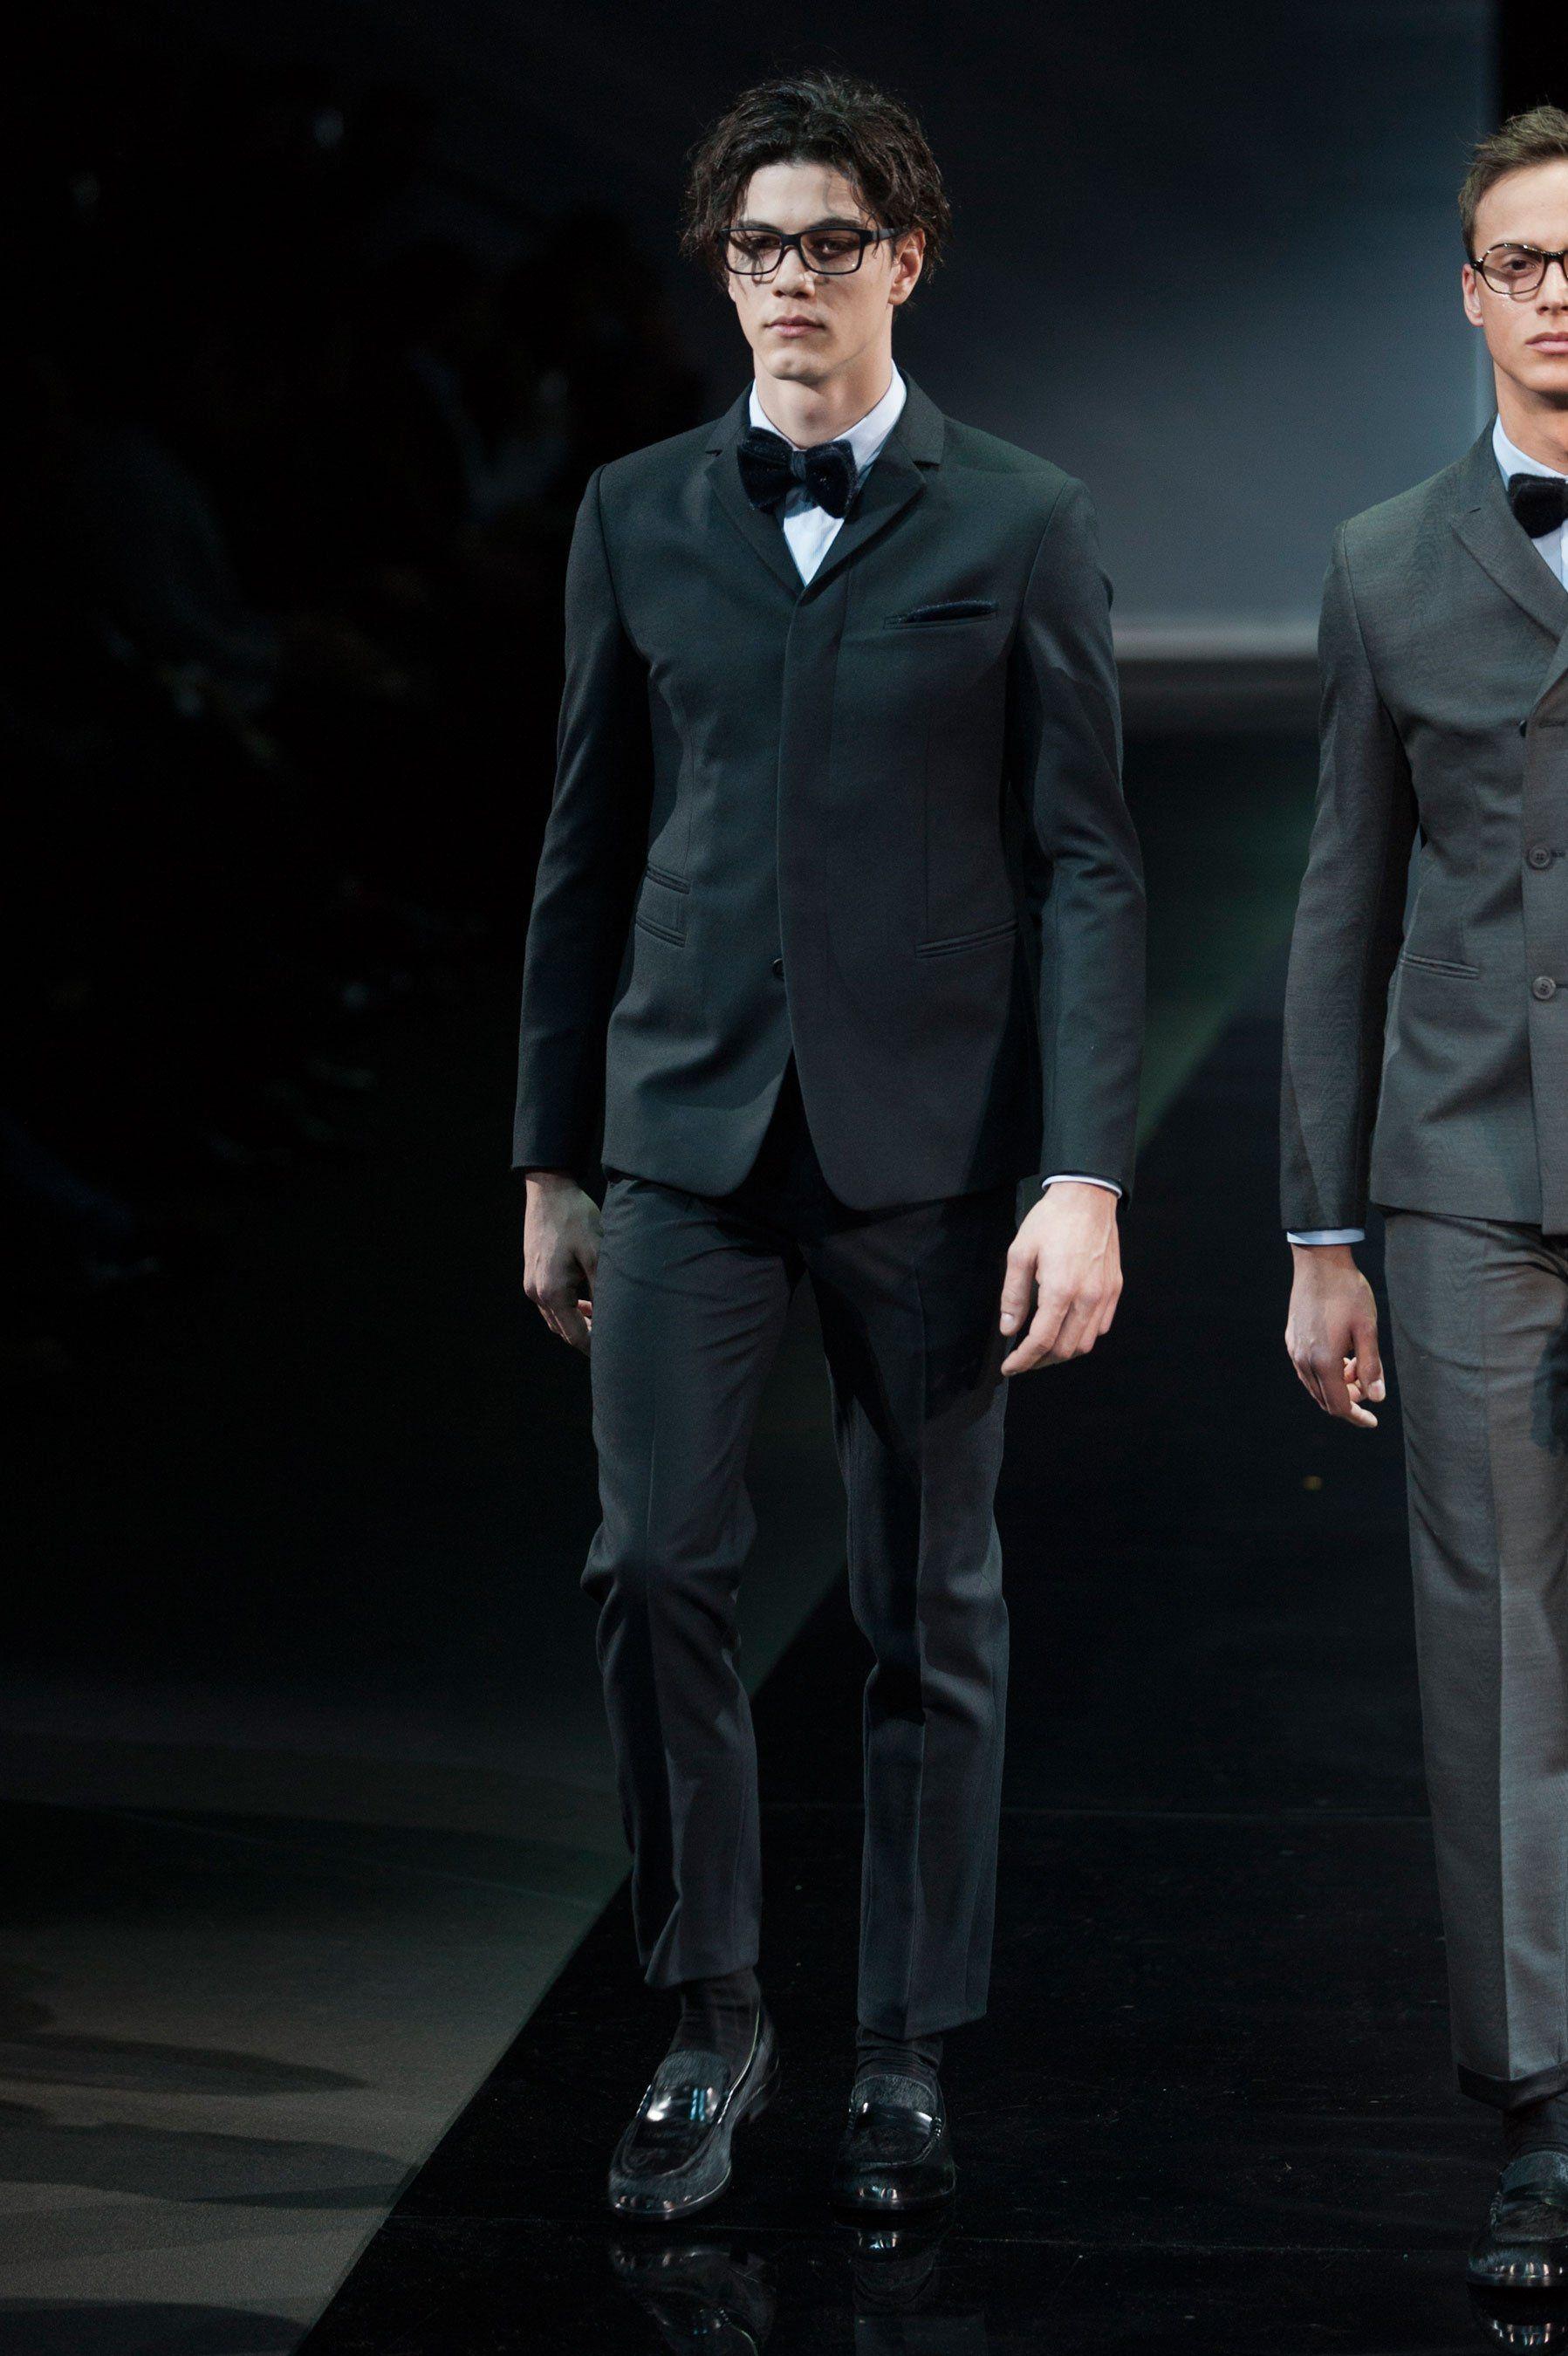 Emporio Armani FallWinter 2014-2015 Collection – Milan Fashion Week Emporio Armani FallWinter 2014-2015 Collection – Milan Fashion Week new pics